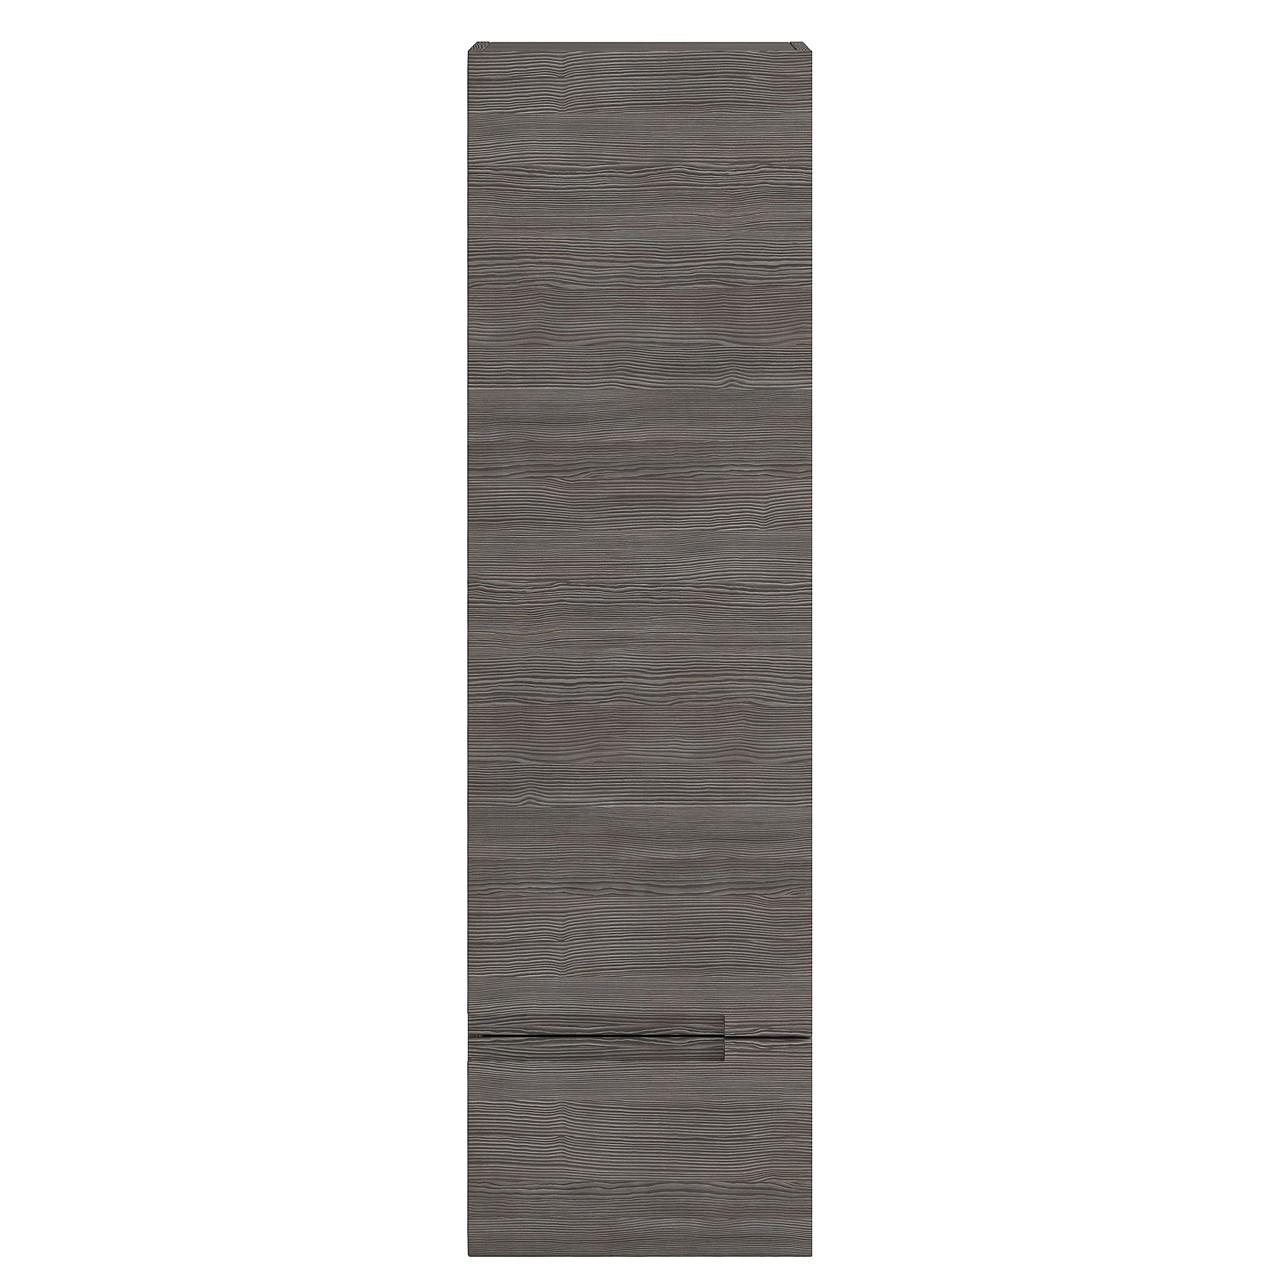 https://www.mepstock.co.uk/admin/images/Hudson-reed_urban_grey-Avola_400mm_Tall-Unit-FMU562.jpg